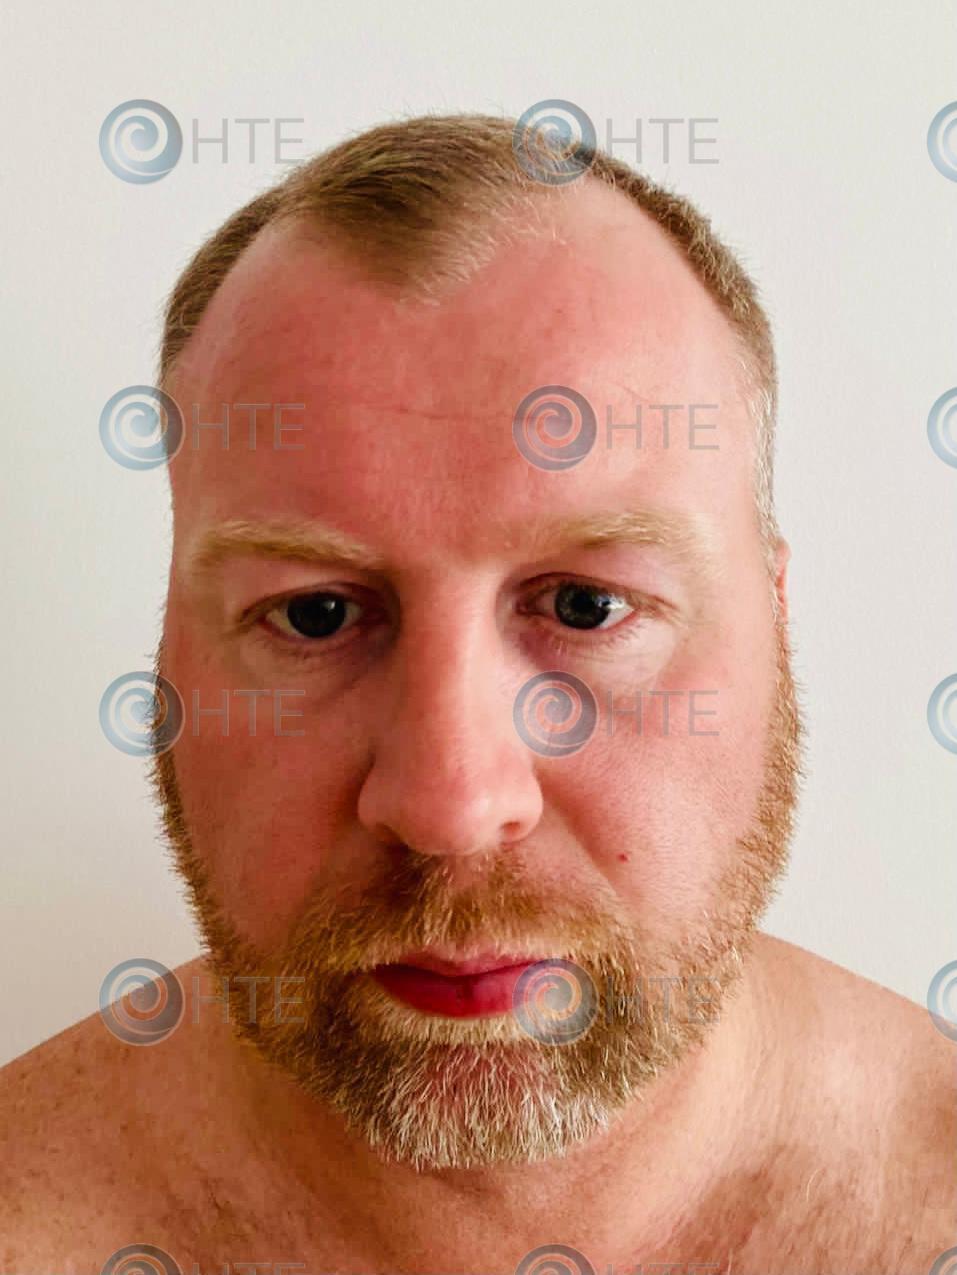 Hair-Transplant-Edinburgh-Clinic-Client-before